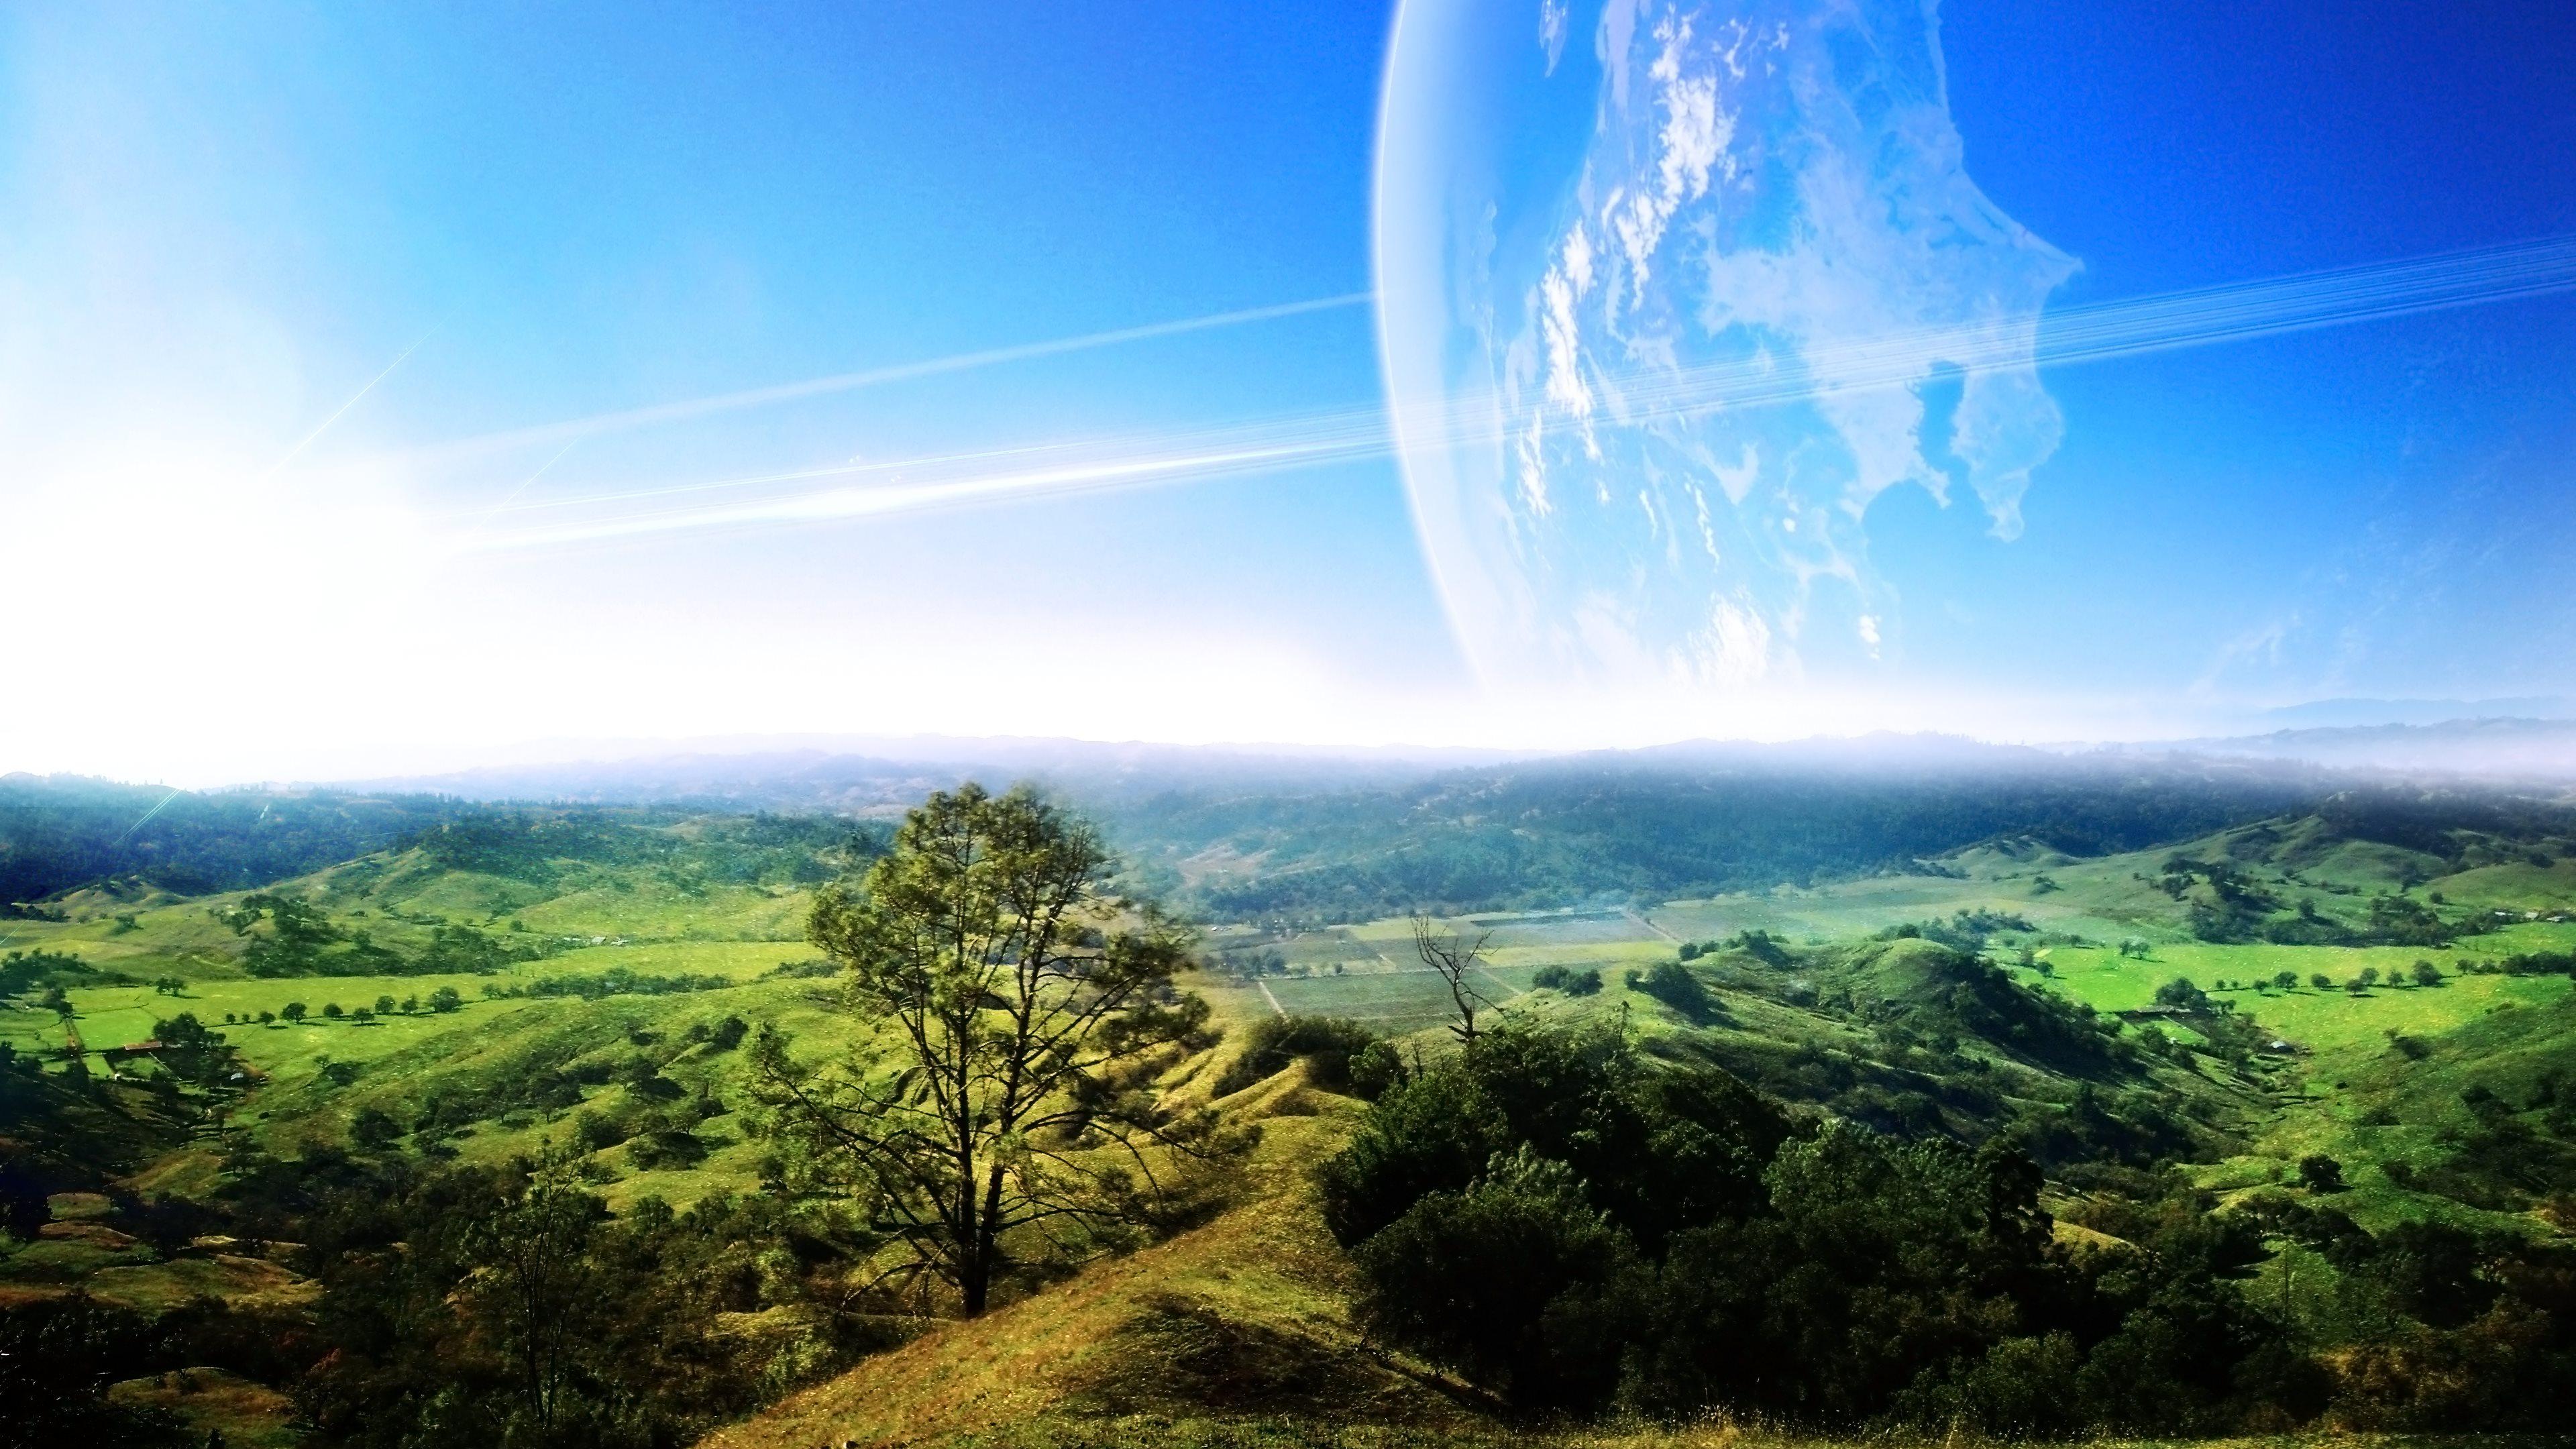 HD 4K WallPaper Landscape and Space Desktop Backgrounds 3840x2160